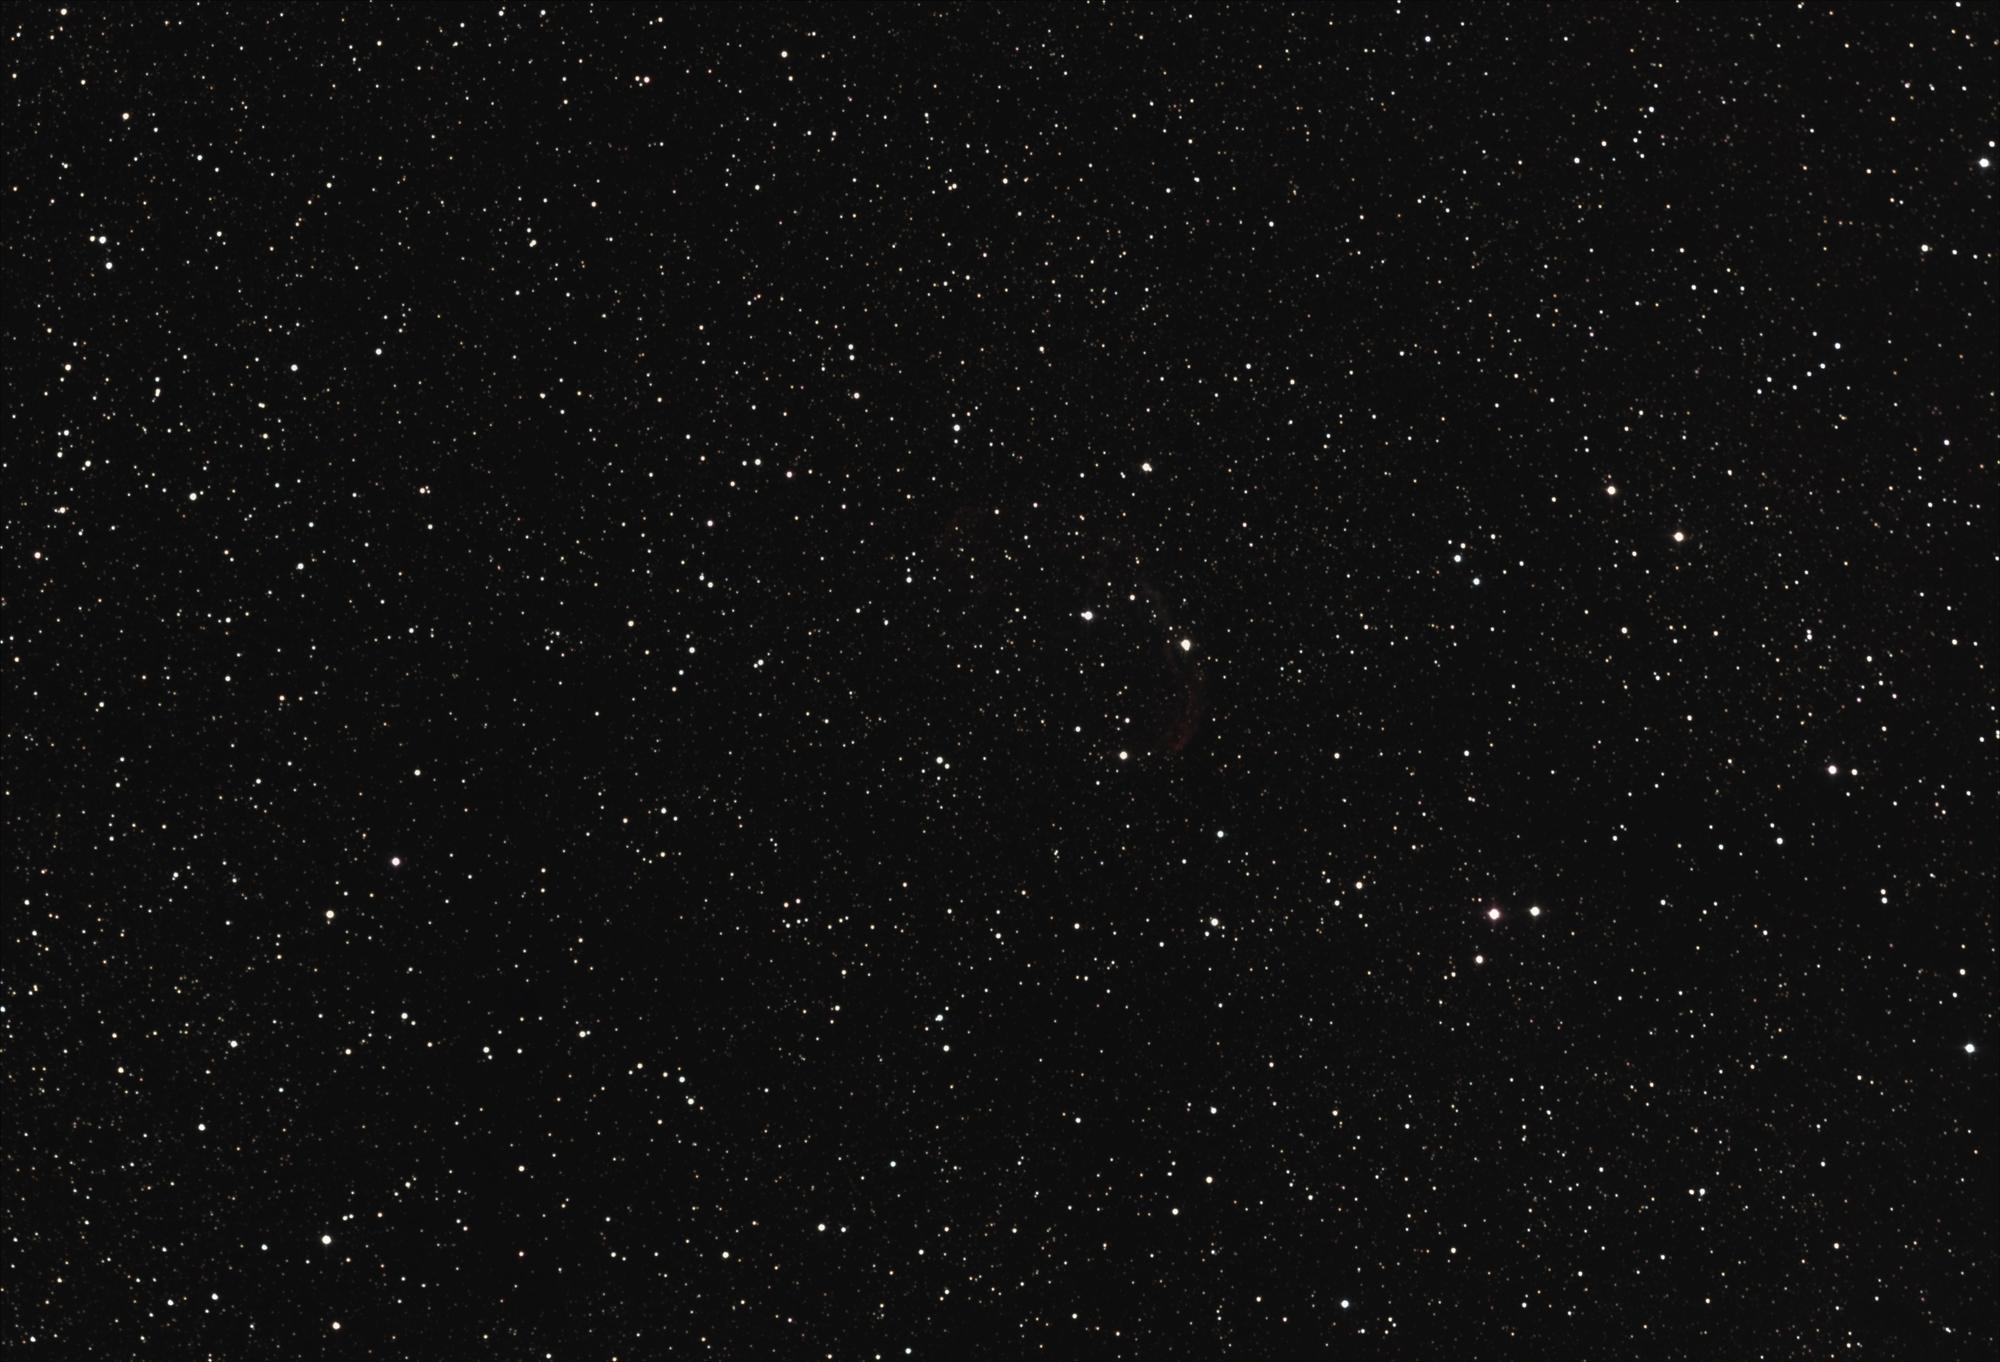 f:id:snct-astro:20190827223827j:plain